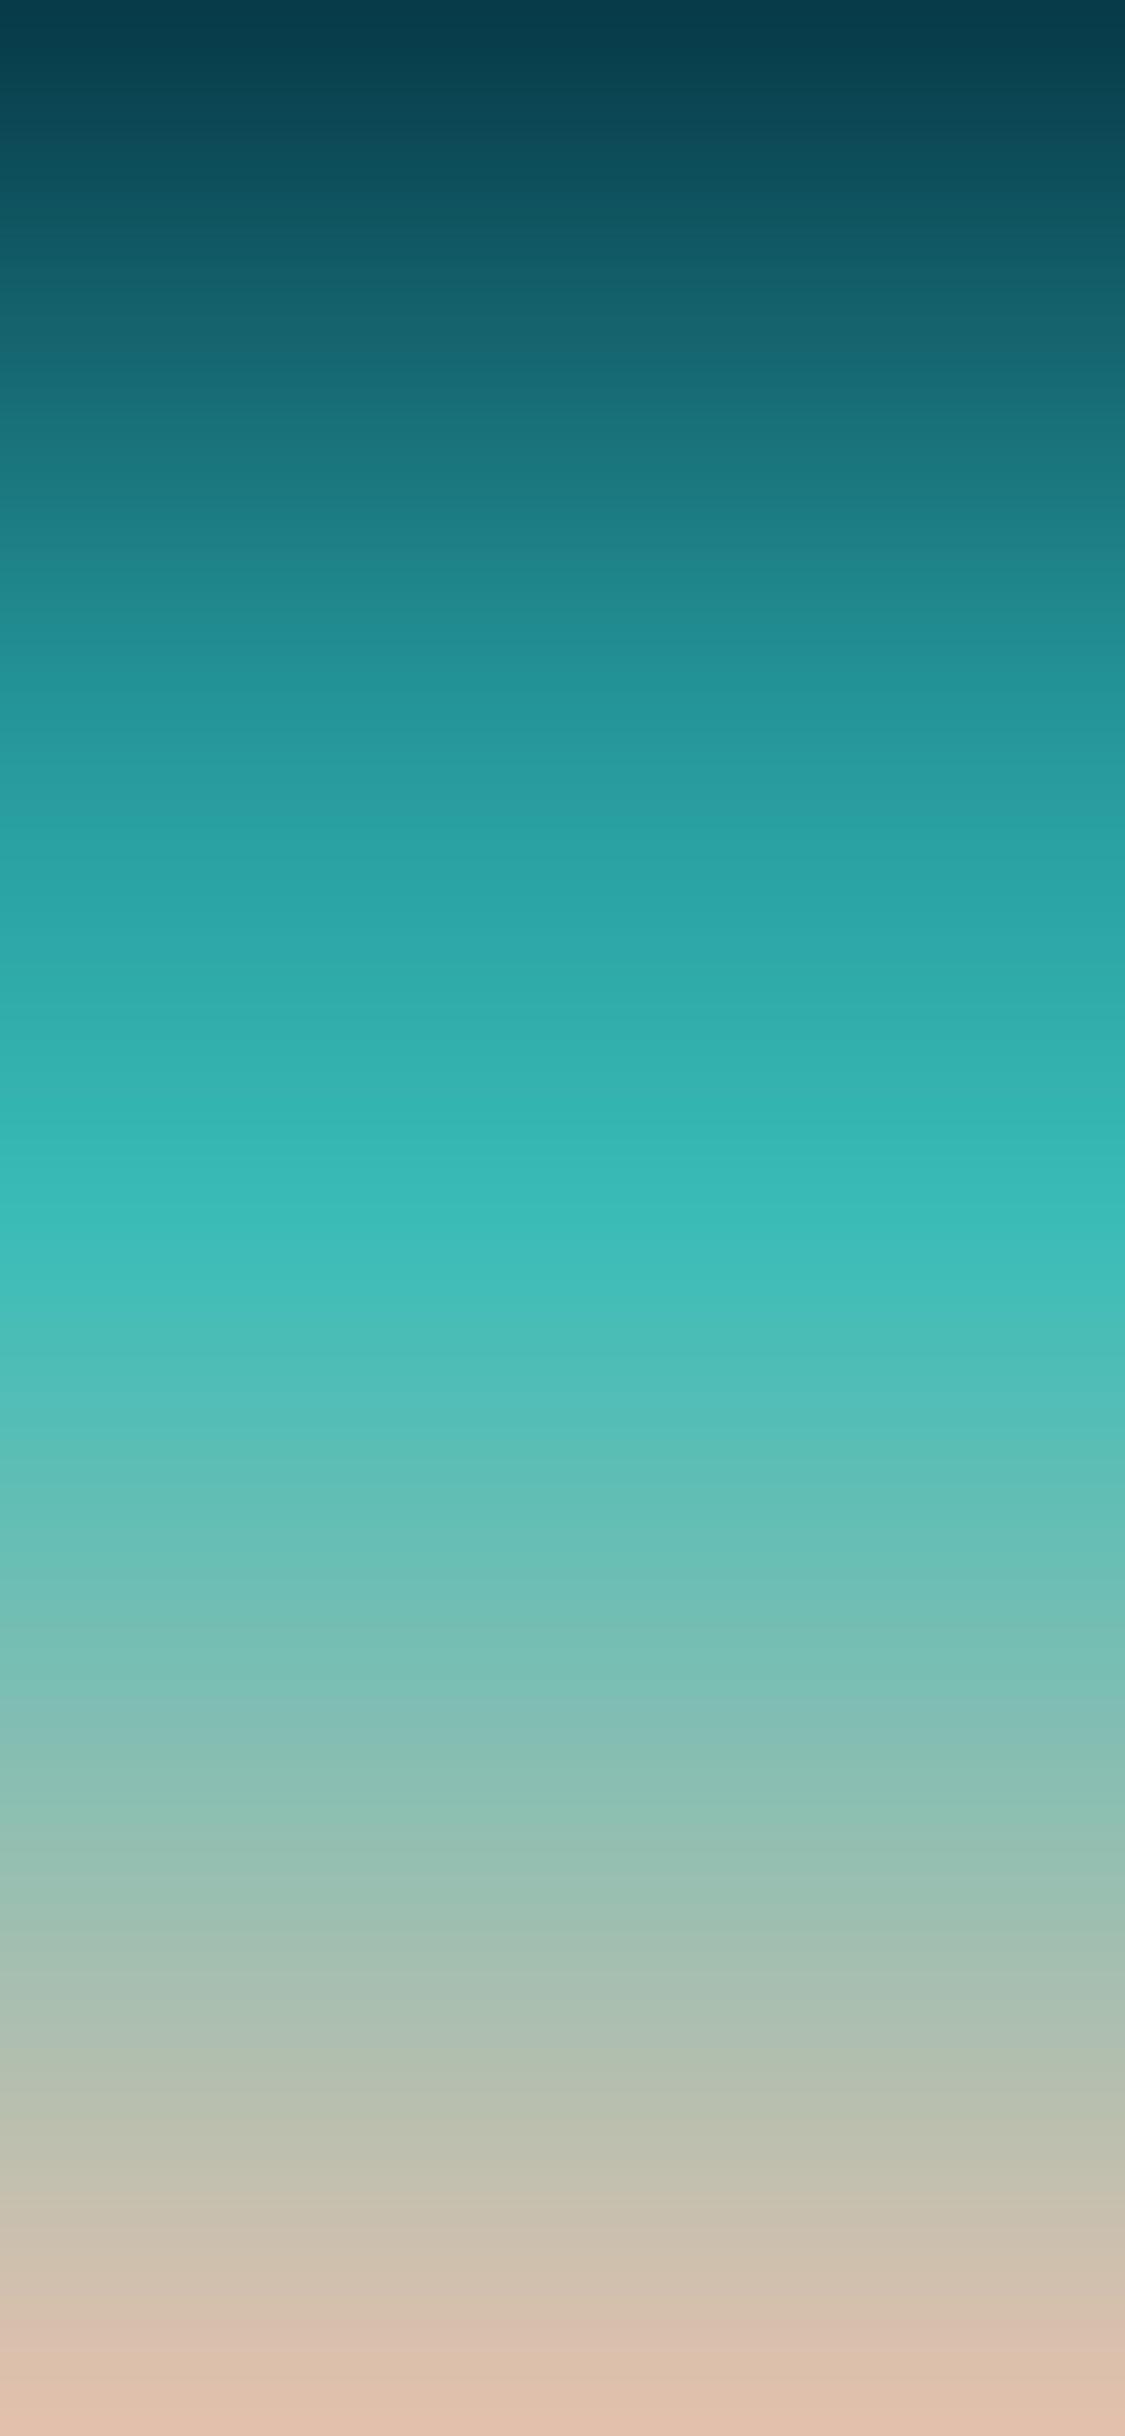 iPhoneXpapers.com-Apple-iPhone-wallpaper-sl25-iphone8-ios11-blue-background-apple-blur-gradation